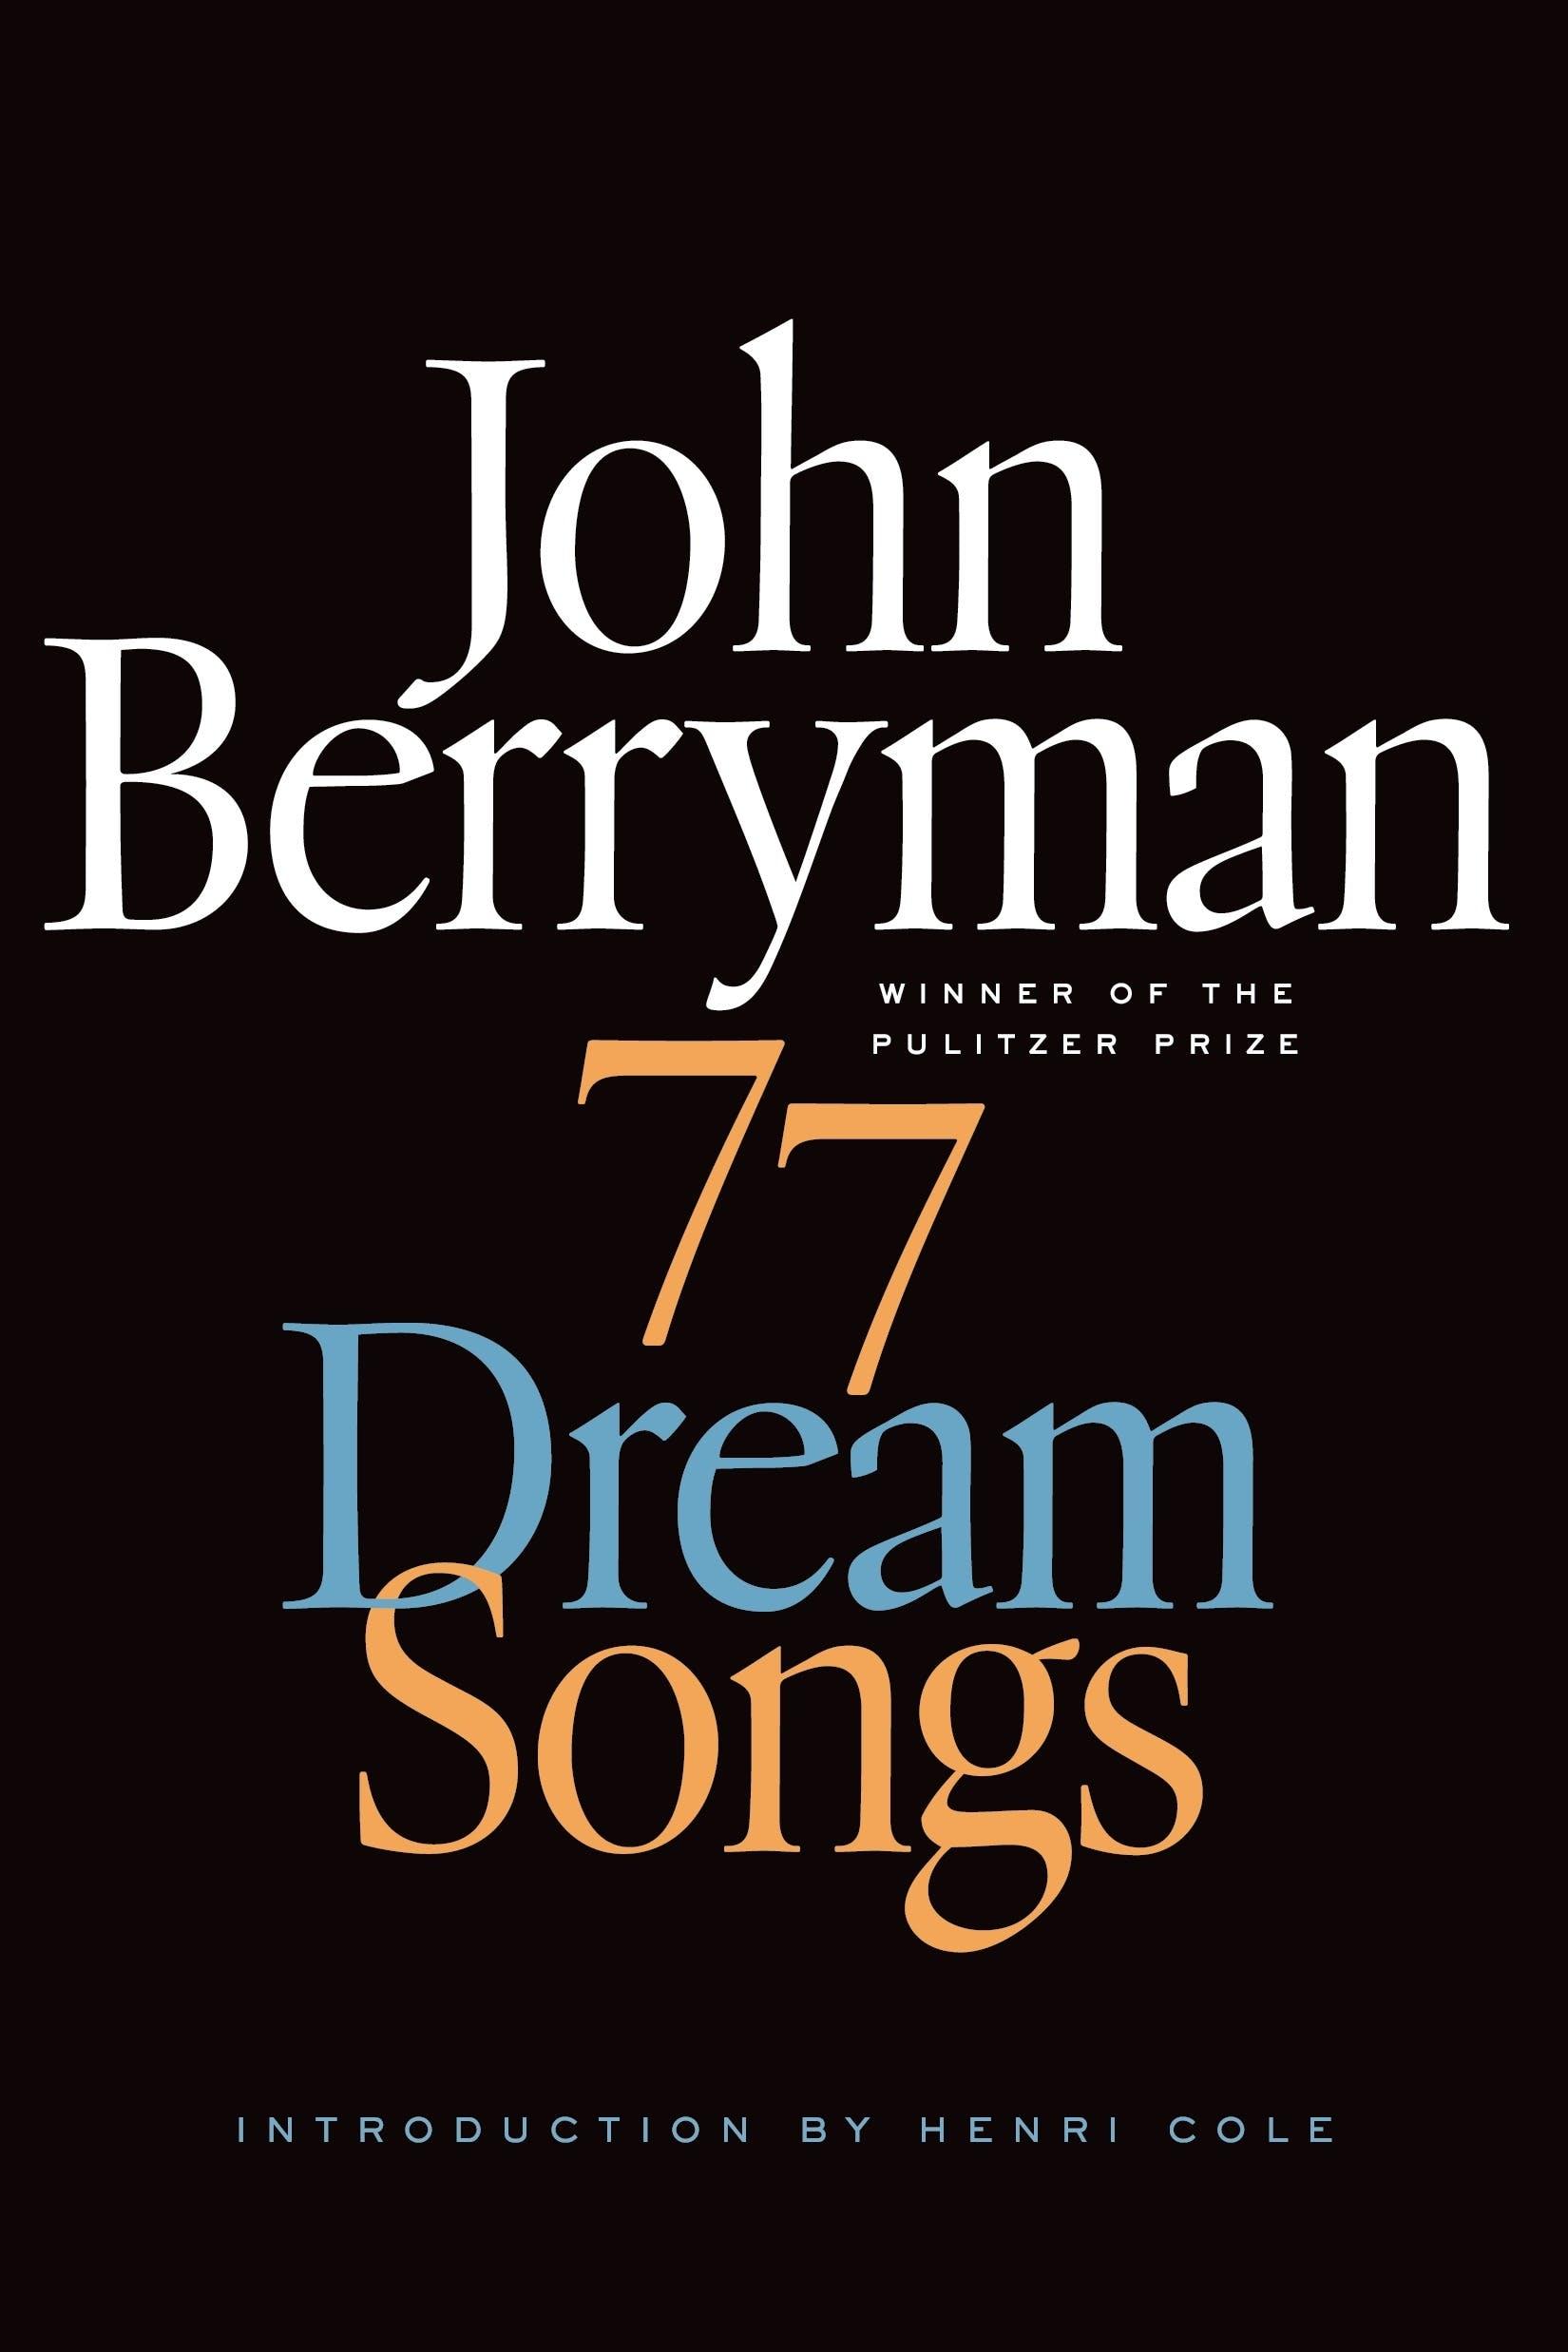 Image of 77 Dream Songs